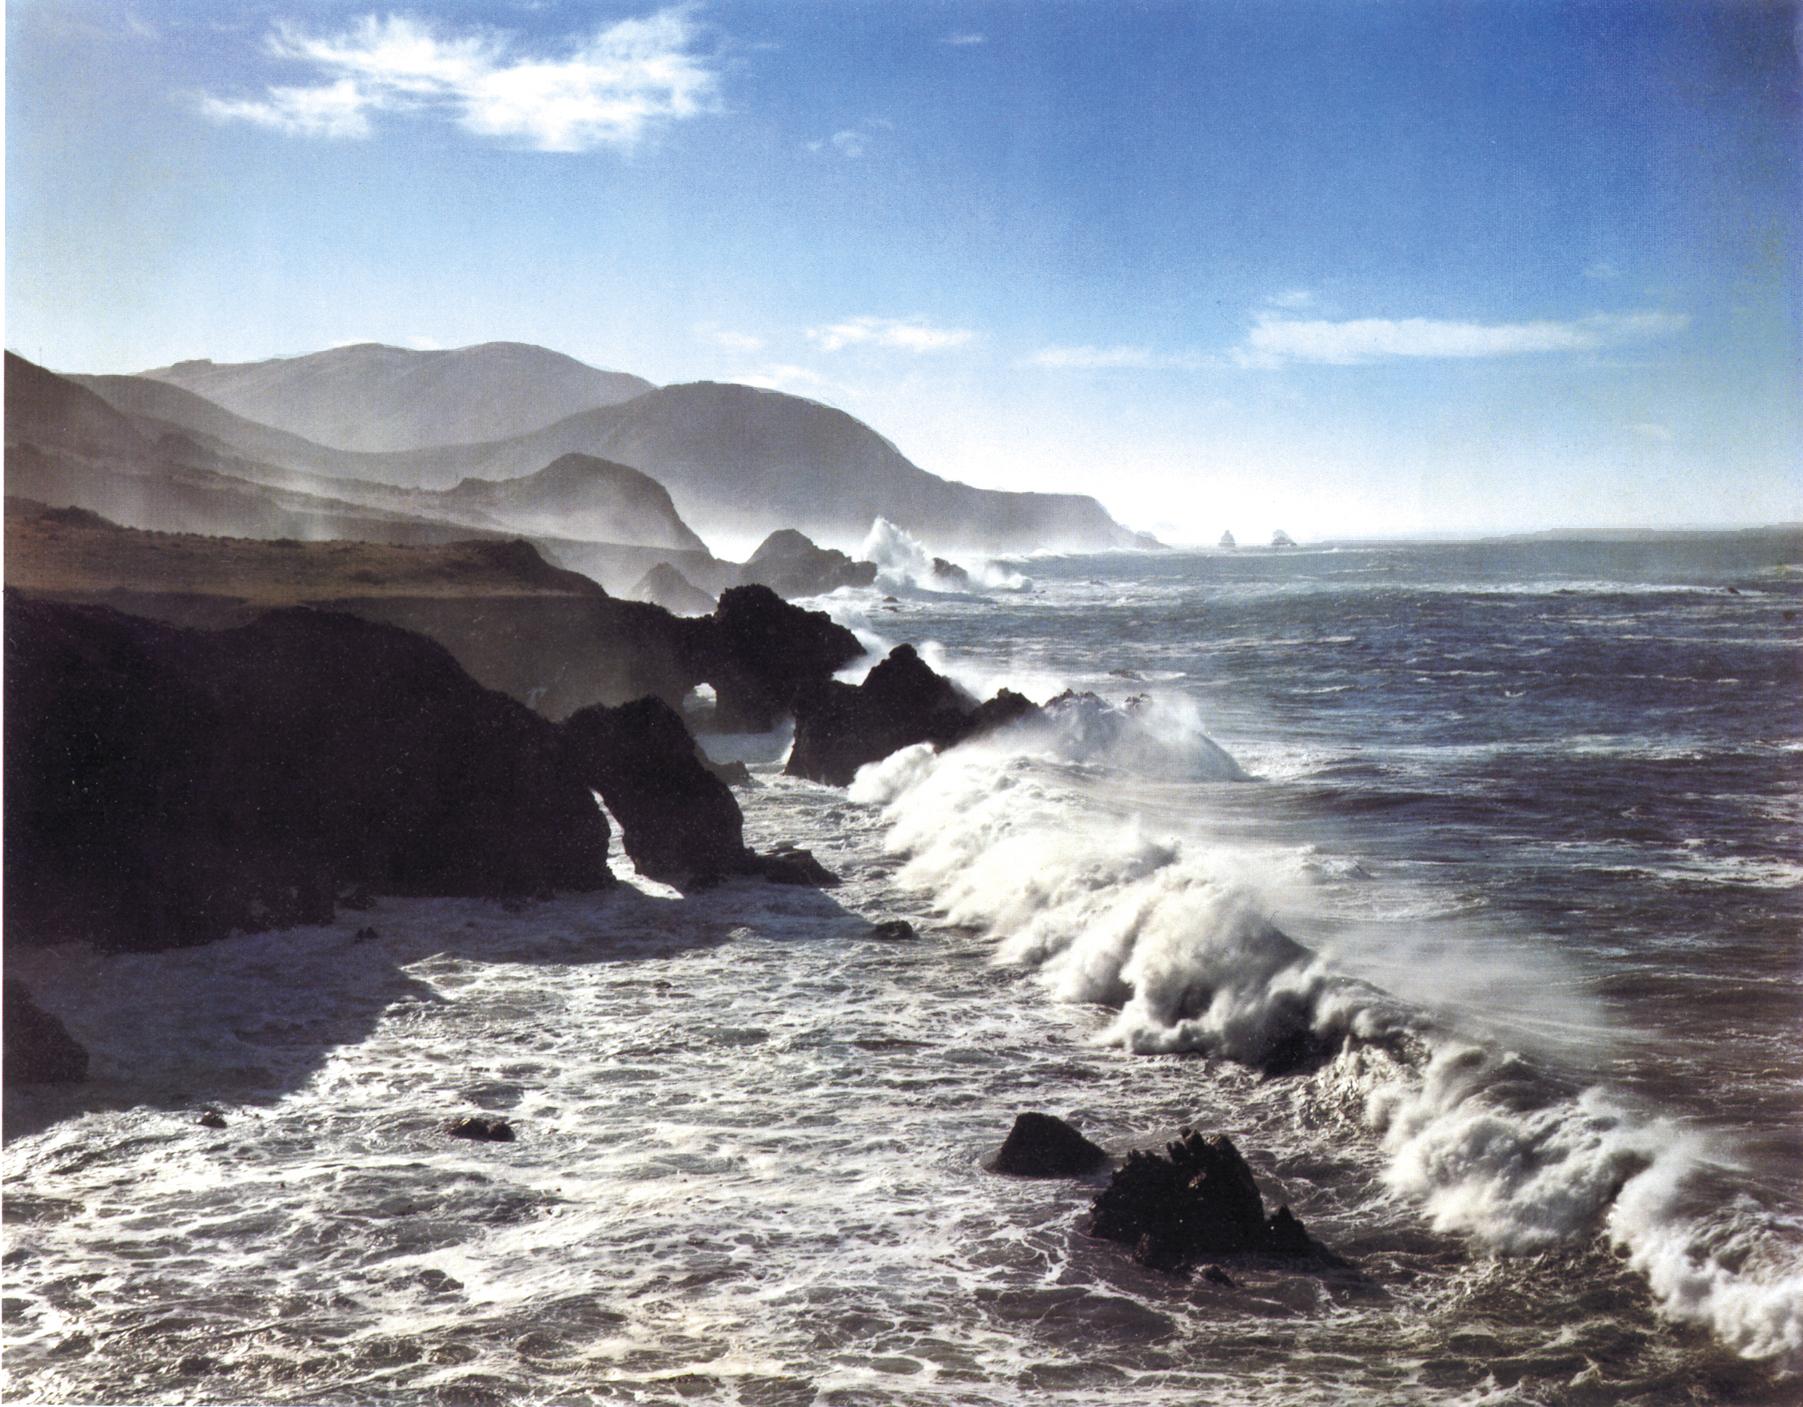 Surf and Headlands, California, 1958